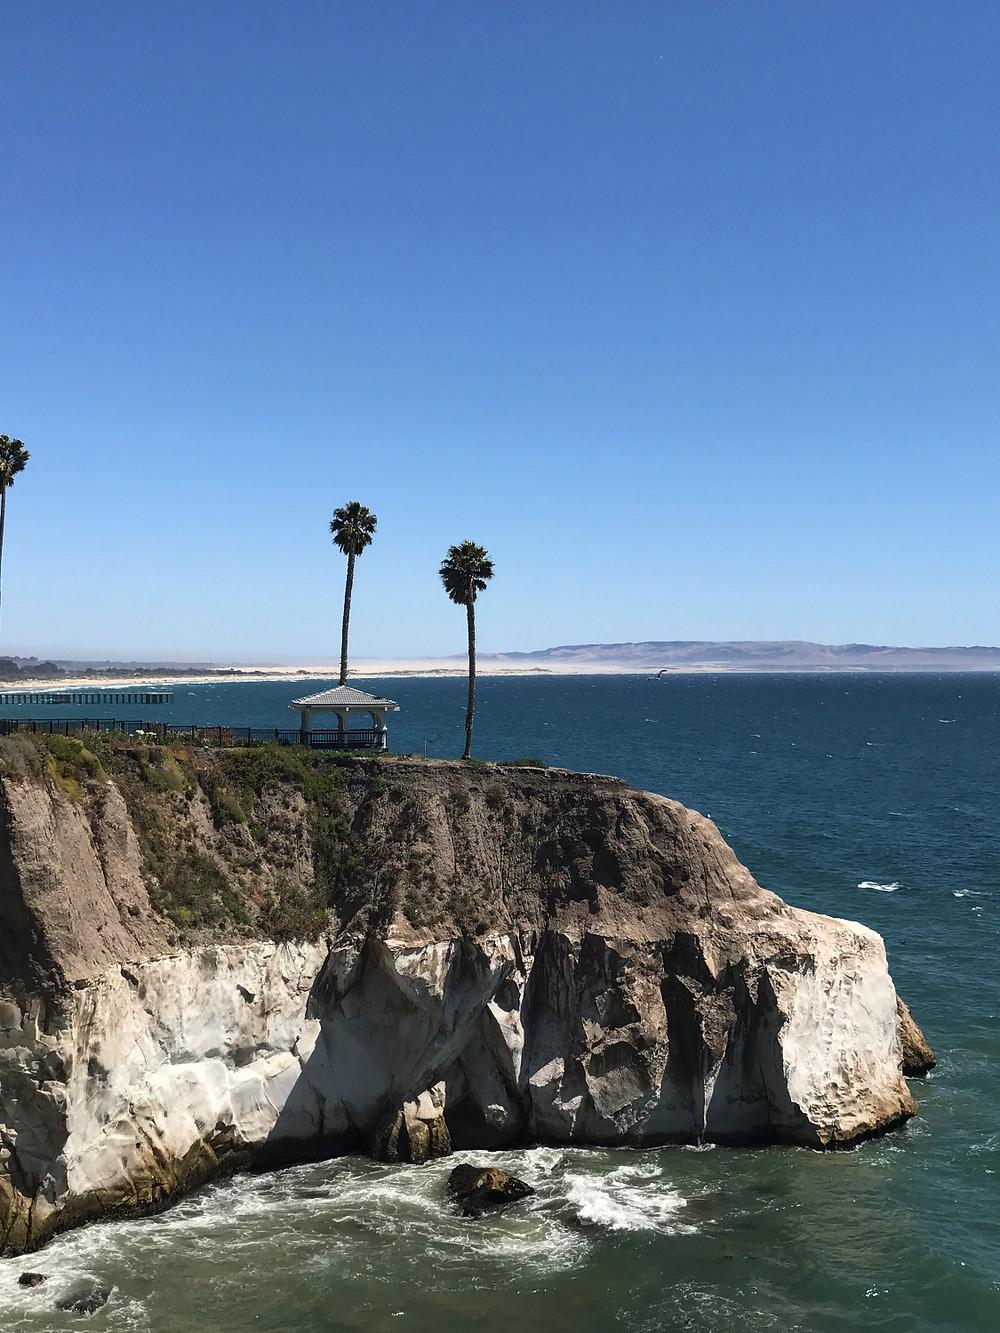 Above the Pacific Ocean, near Pismo Beach, CA